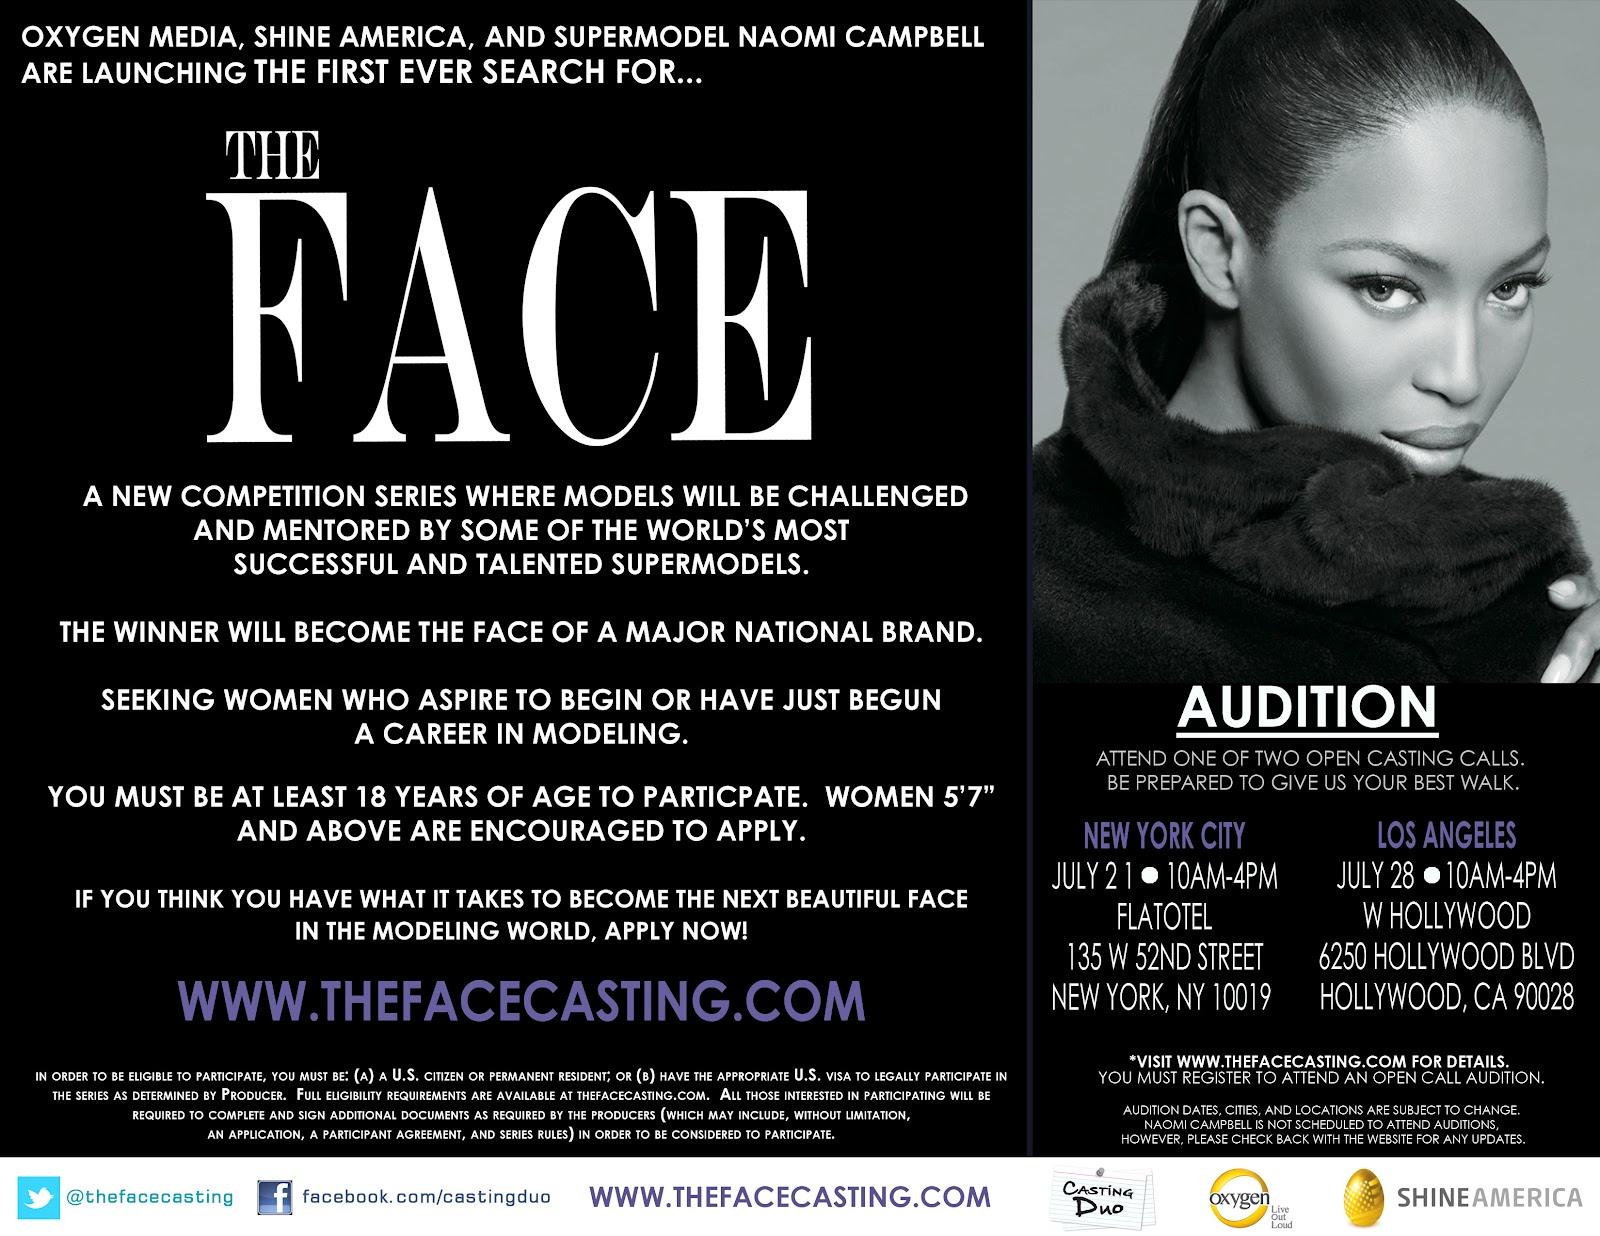 http://4.bp.blogspot.com/-M42X-jmQgdc/T_tST5ENf2I/AAAAAAAAGtM/E5-hKT7-19w/s1600/New_Face_Flyerv(F).jpg